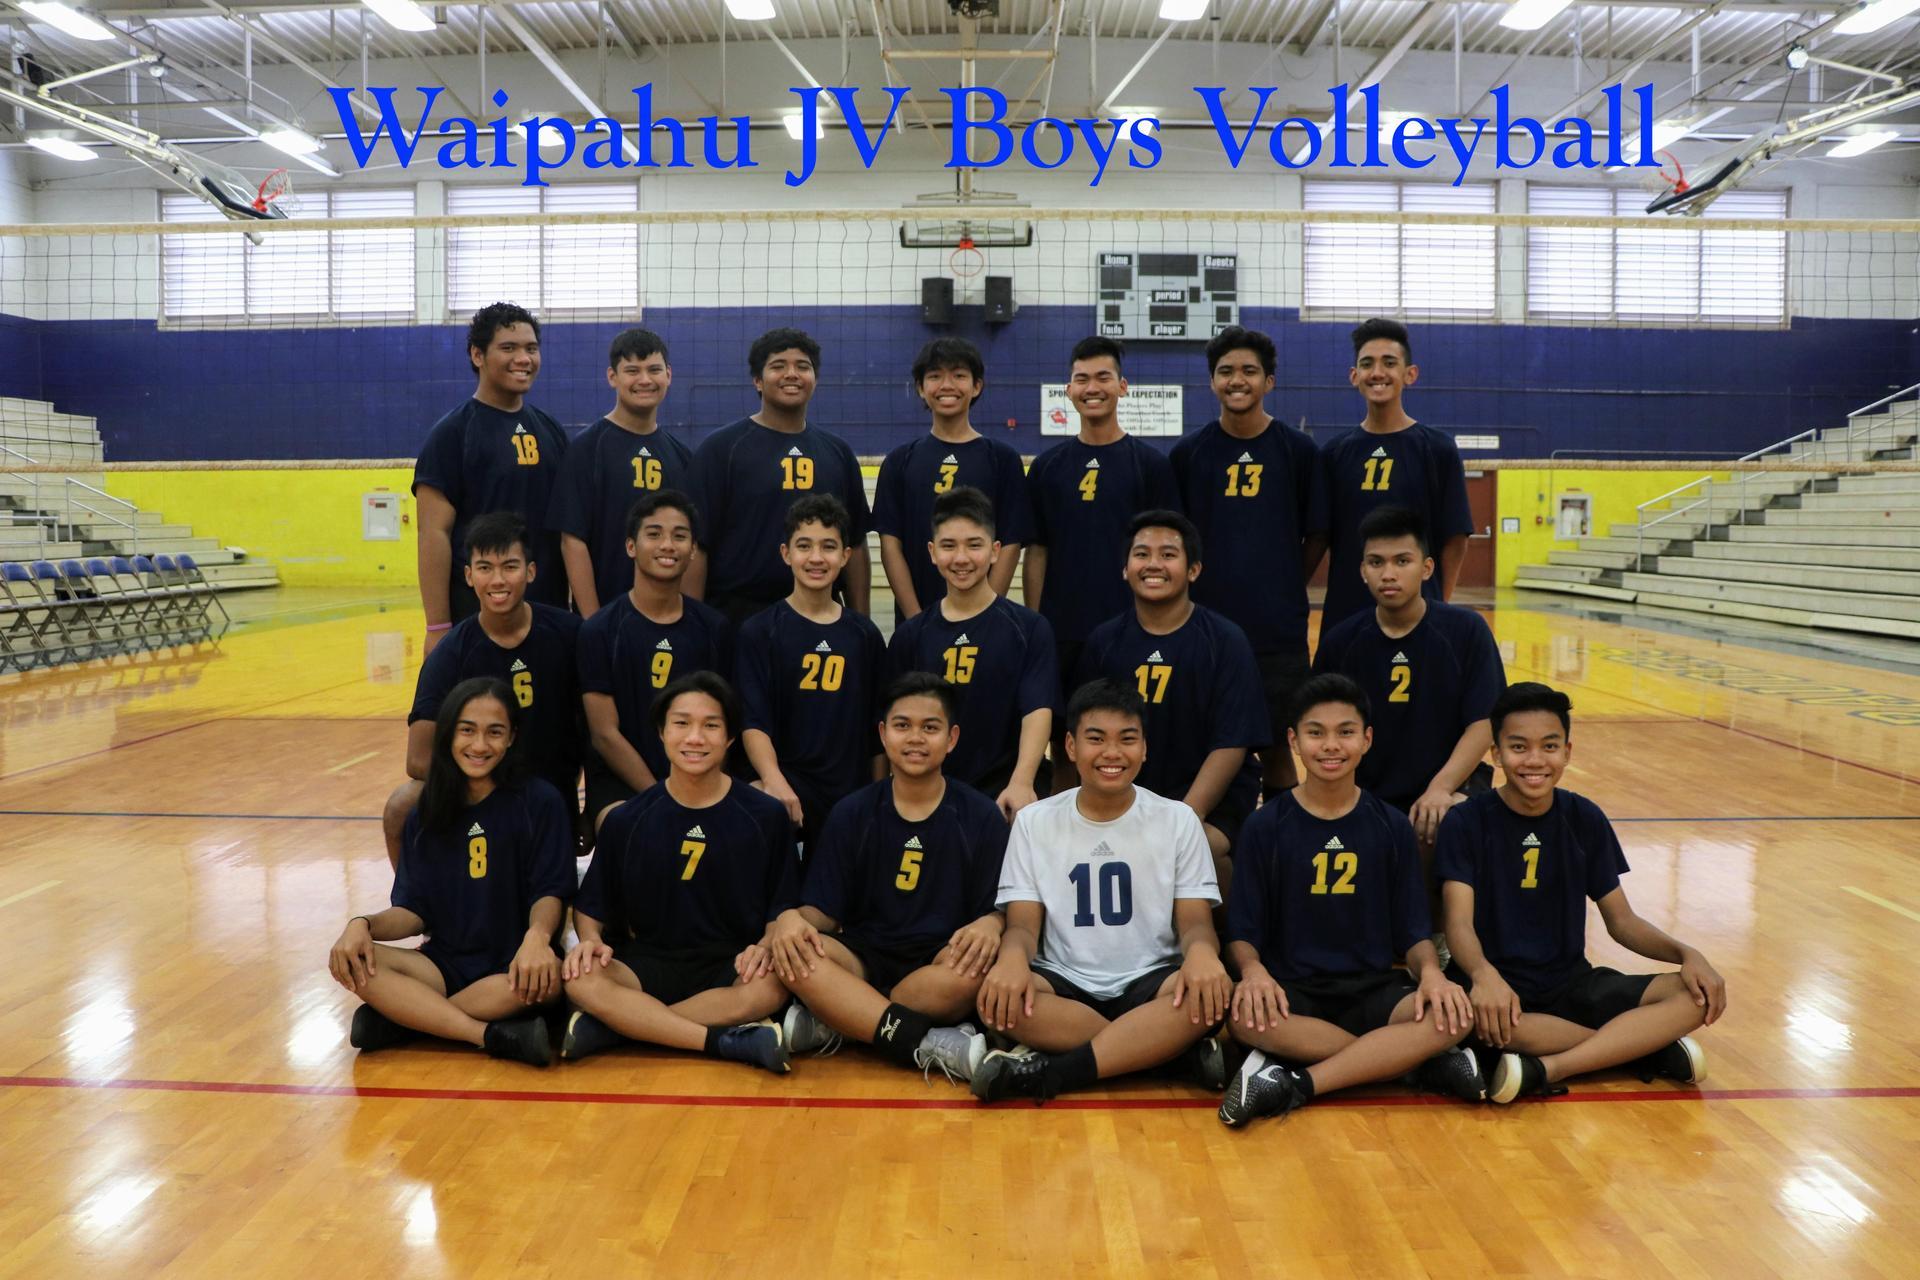 18-19 Volleyball Boys JV